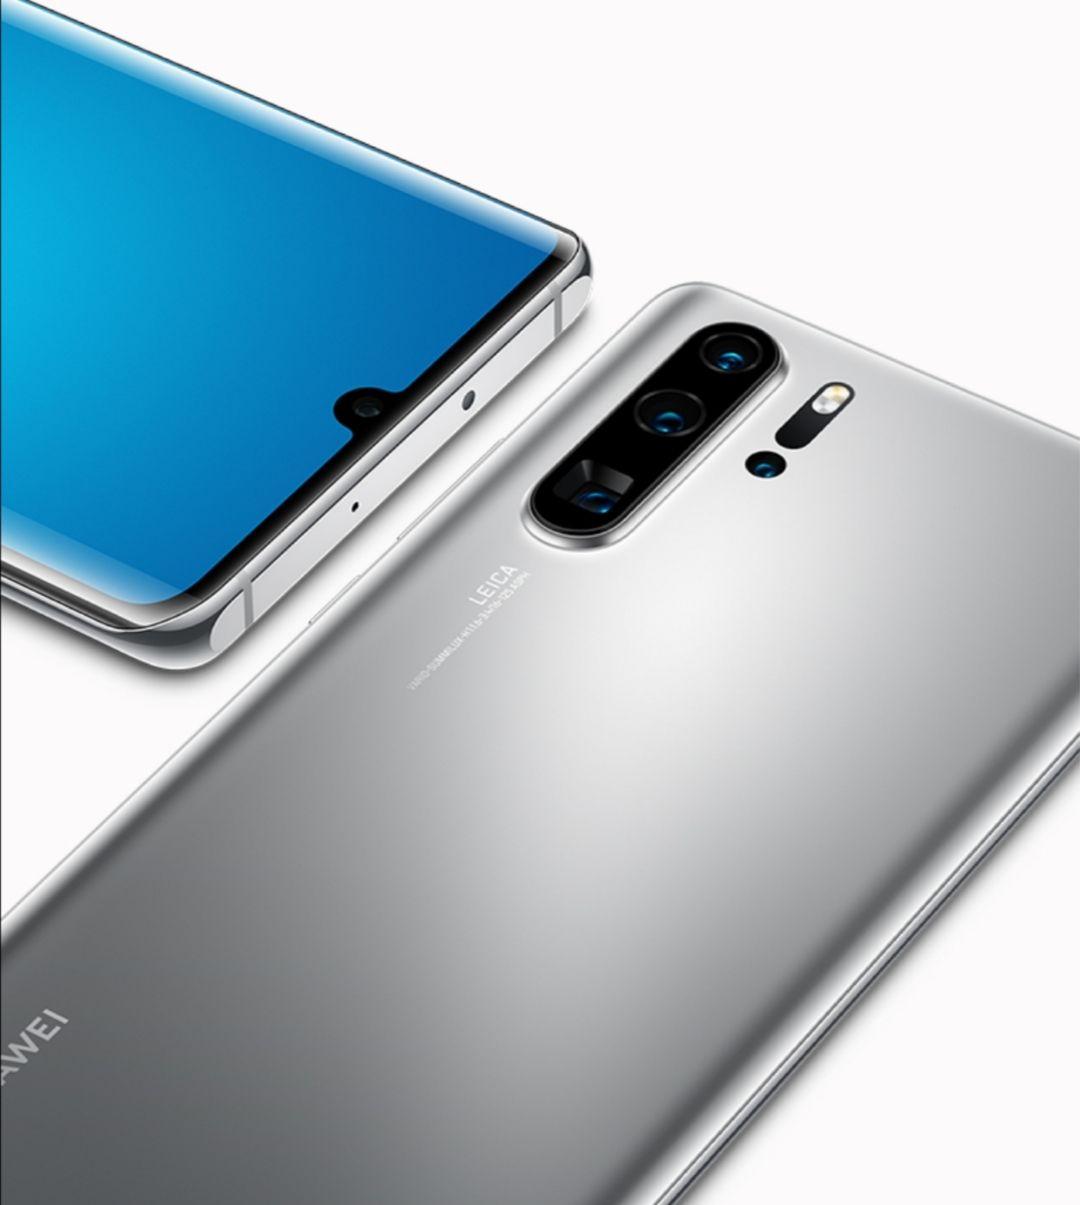 Huawei P30 Pro 256GB Silver New Edition Smartphone - £499.99 / P30 Lite 256GB - £199.99 @ Huawei